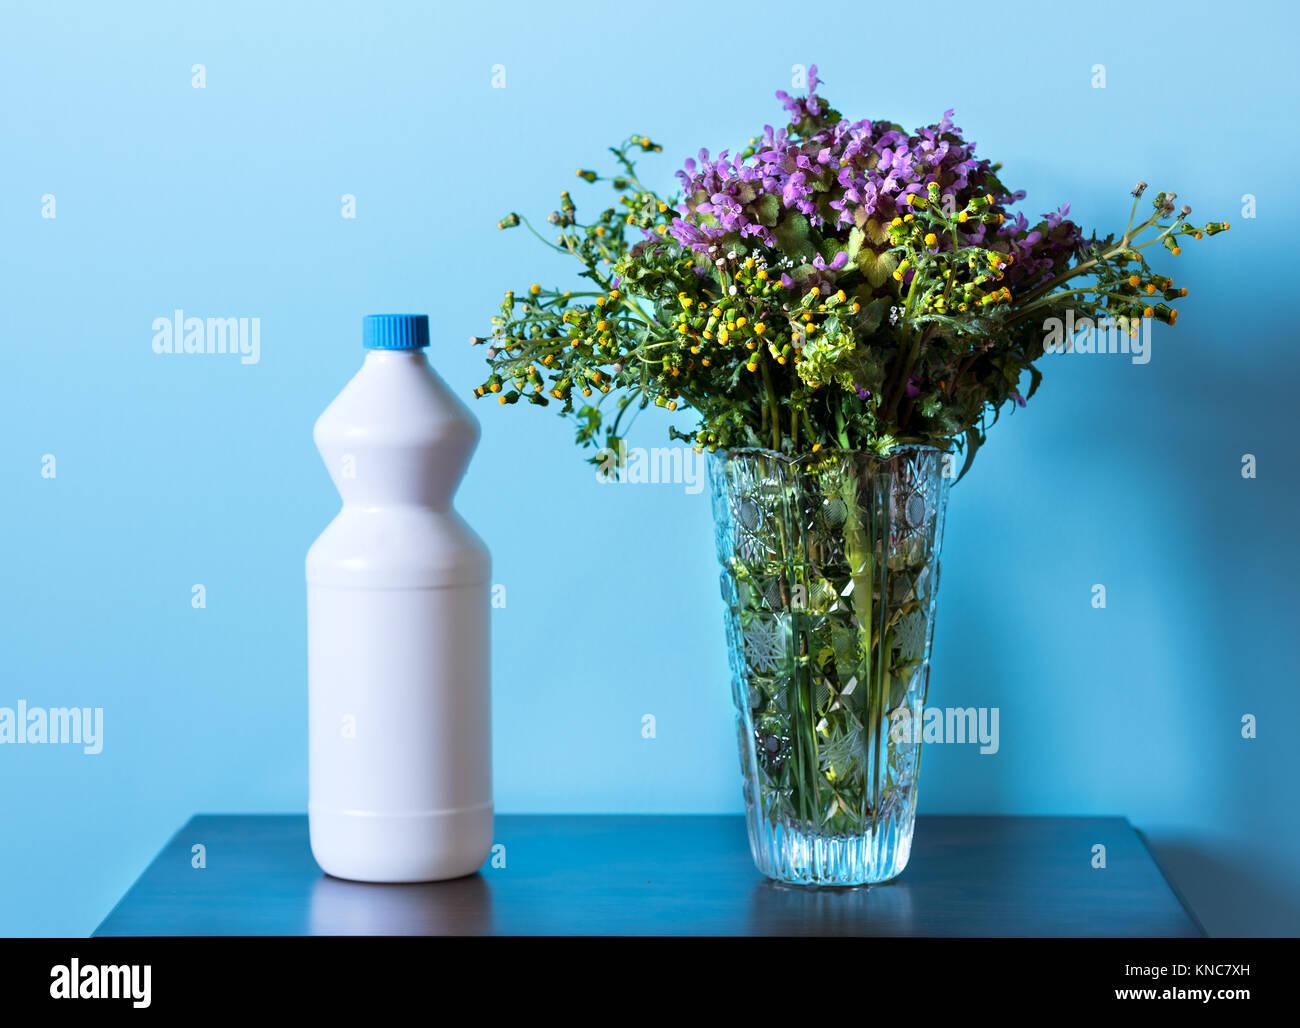 Plastic vase stock photos plastic vase stock images alamy vase flower and white plastic bottle stock image reviewsmspy